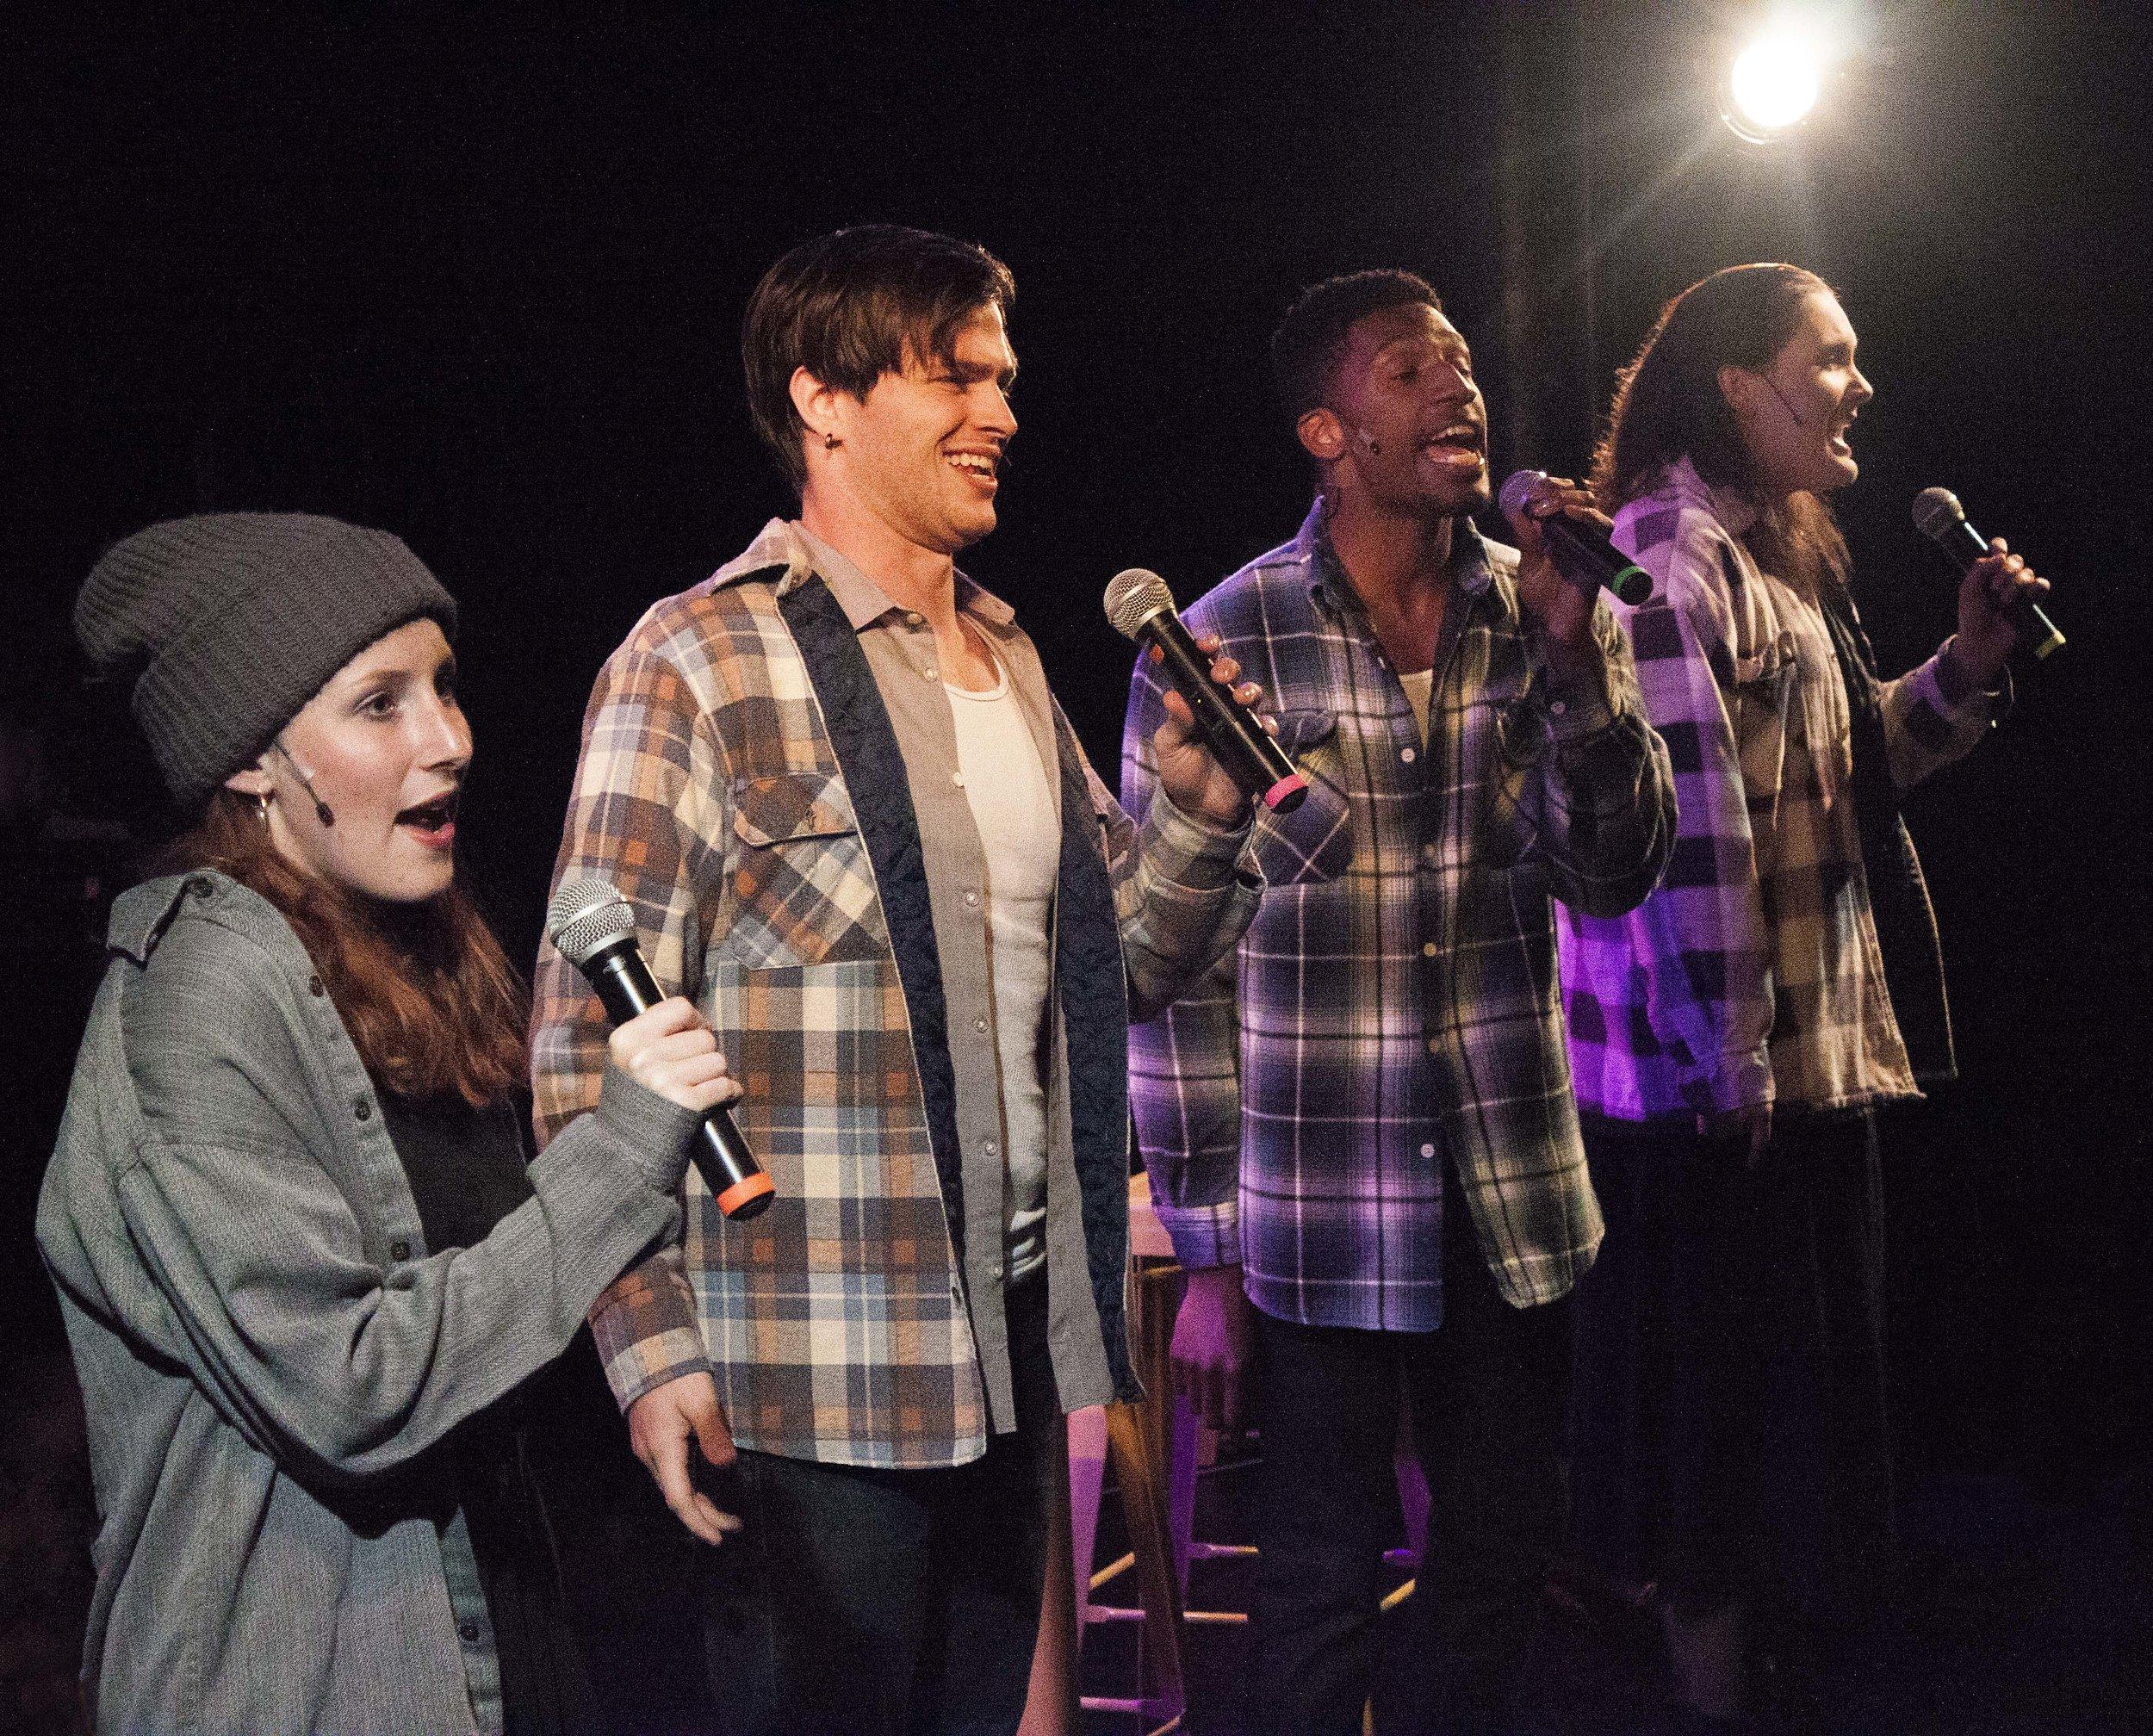 Full Cast (Left to Right): Becca Orts, Kody Bringman, Antonio Tillman, Rebecca Flanders. Photo by Jessie Dobrzynski.